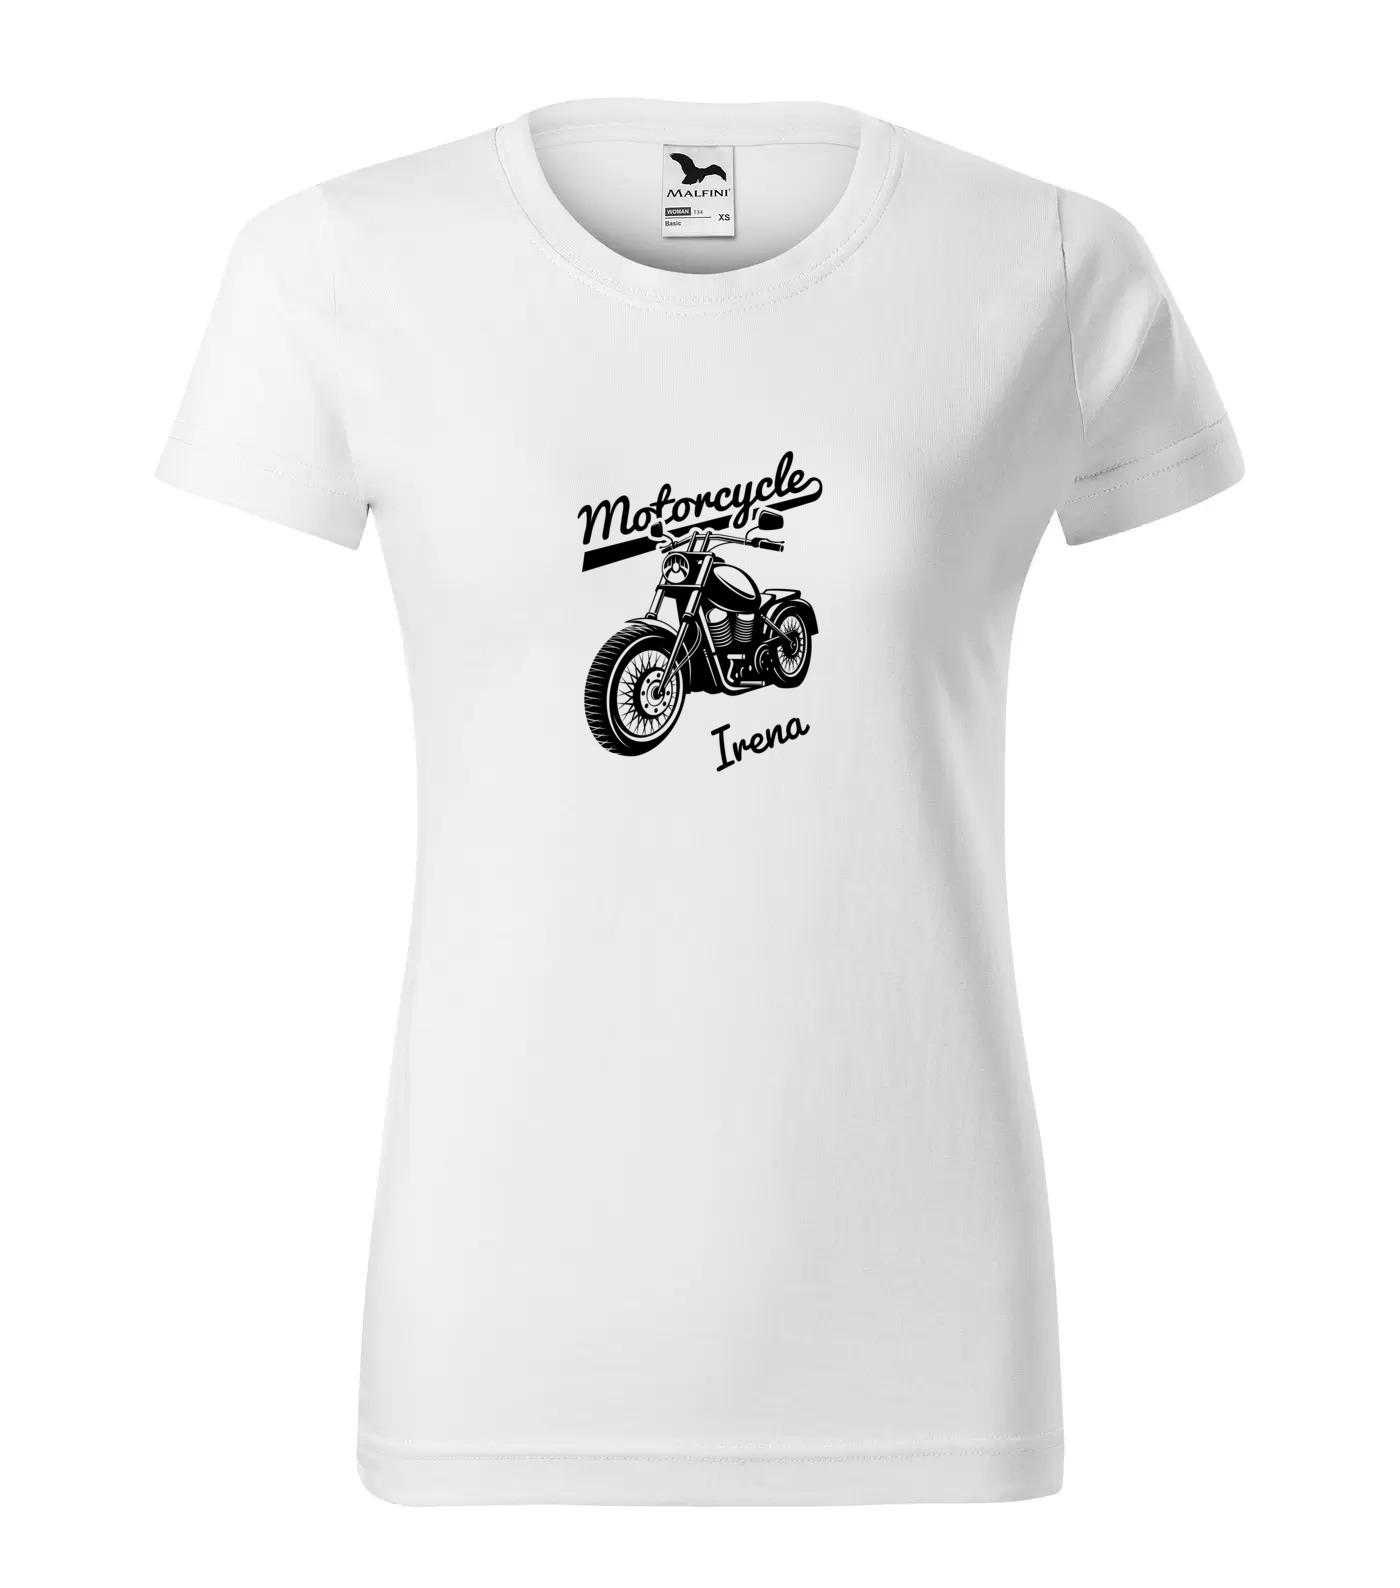 Tričko Motorkářka Irena